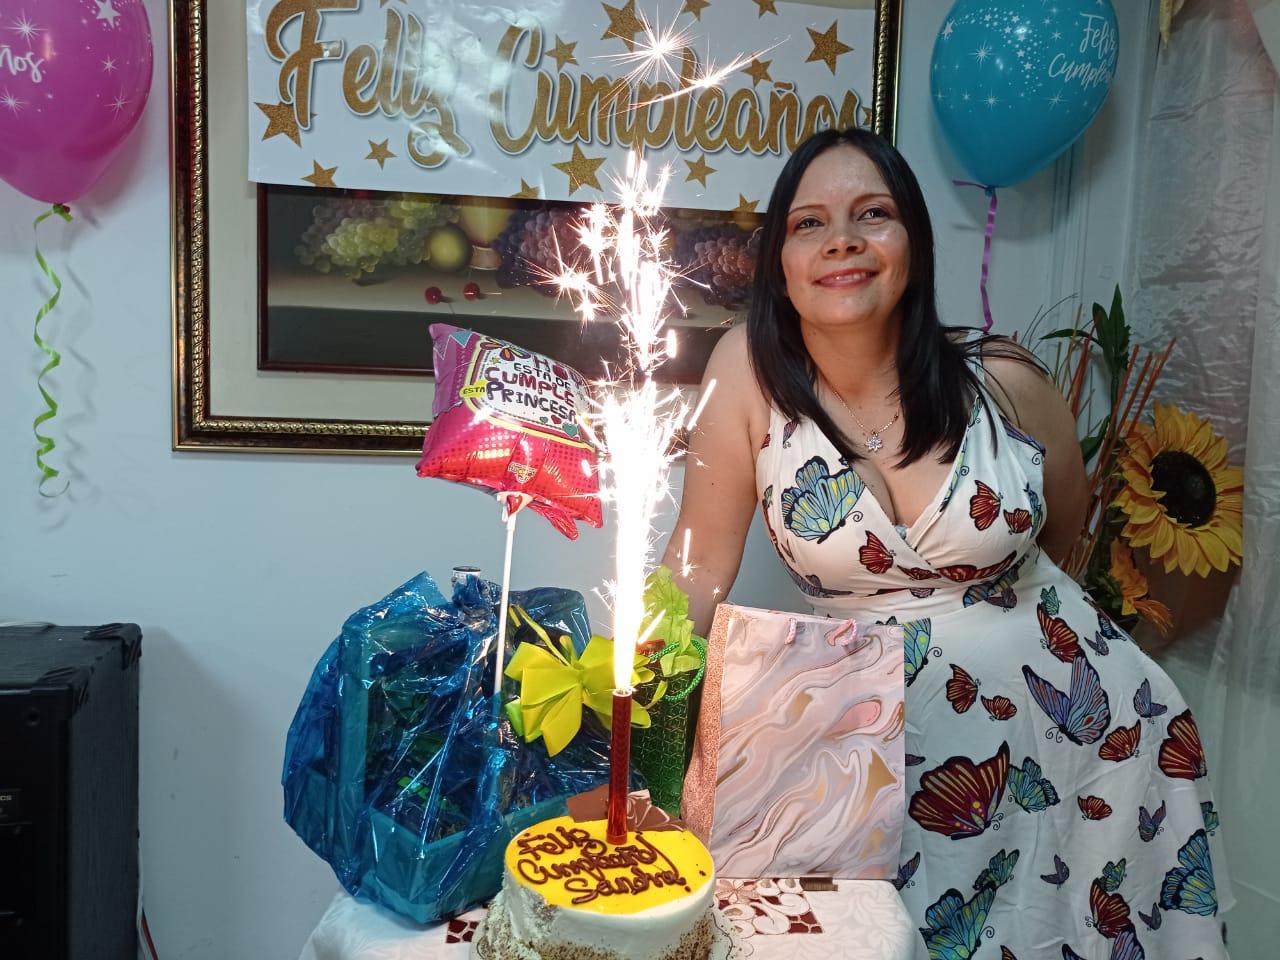 Celebraron sus cumpleaños / Sandra Milena Gaviria Betancourt